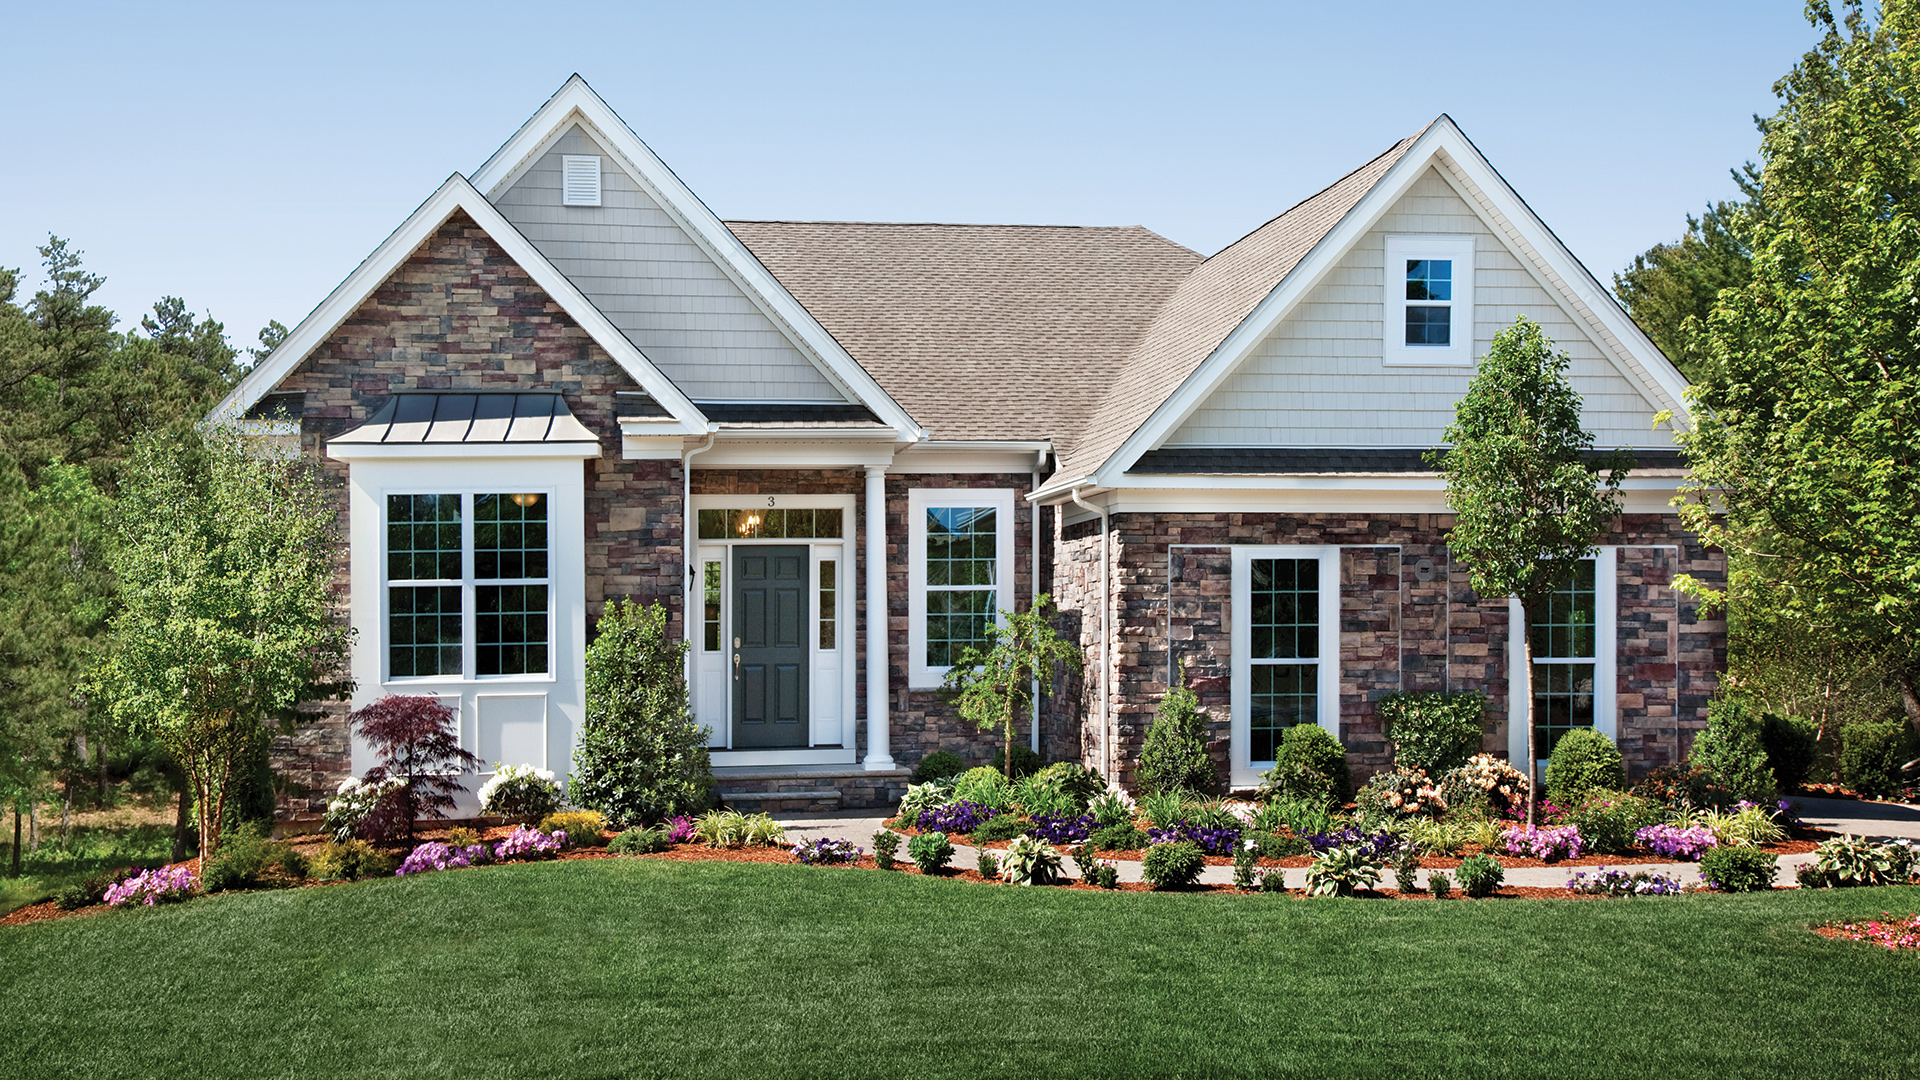 Bayhill Savannah home design